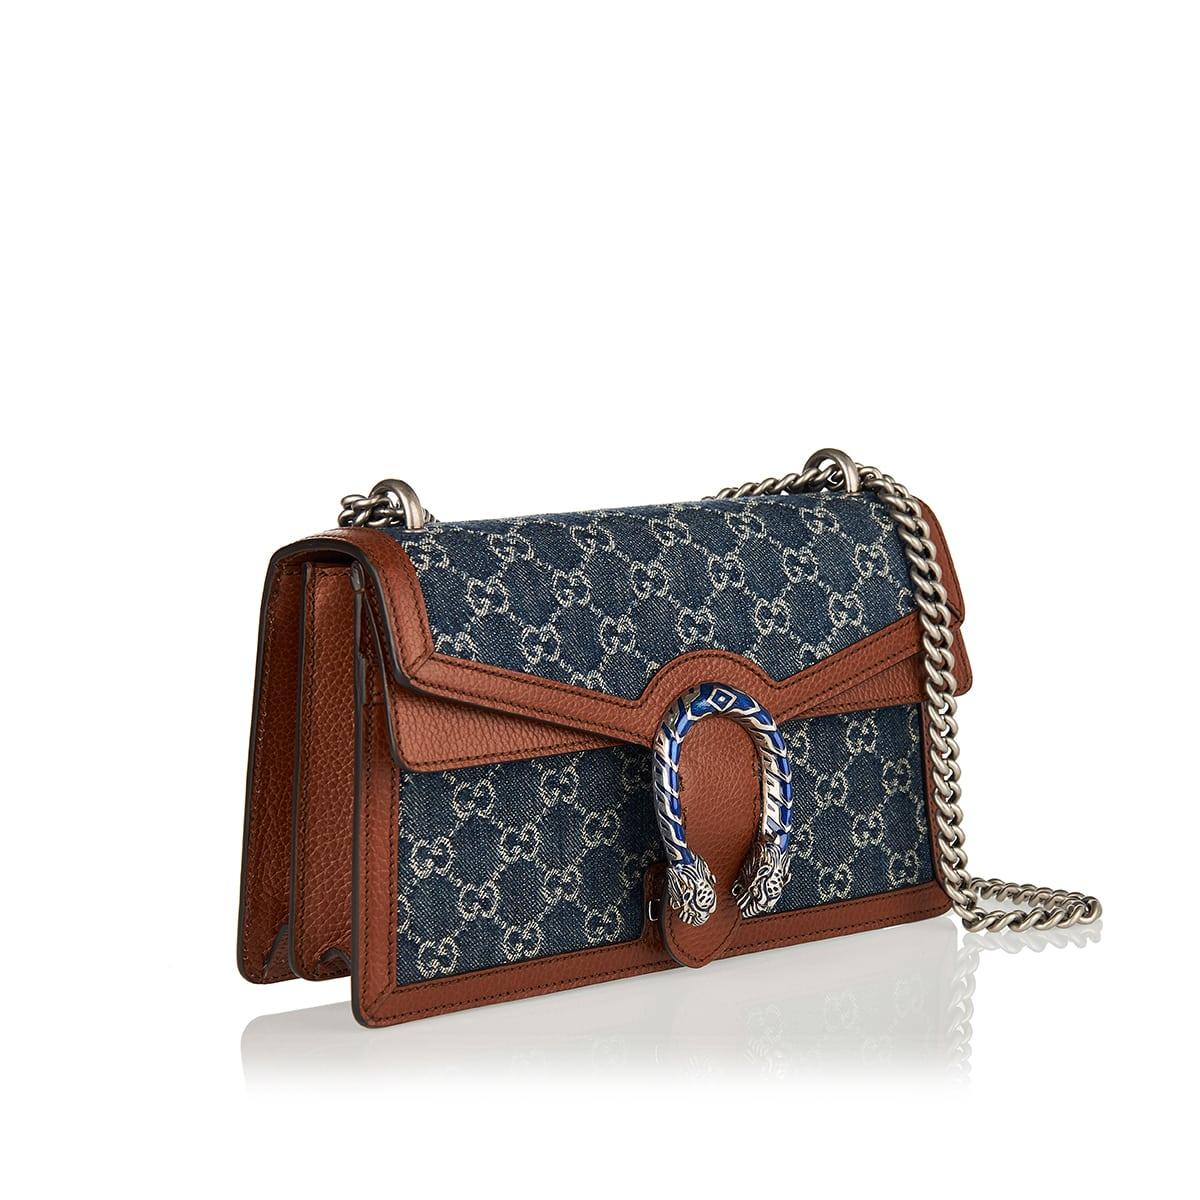 Dionysus Small GG denim shoulder bag